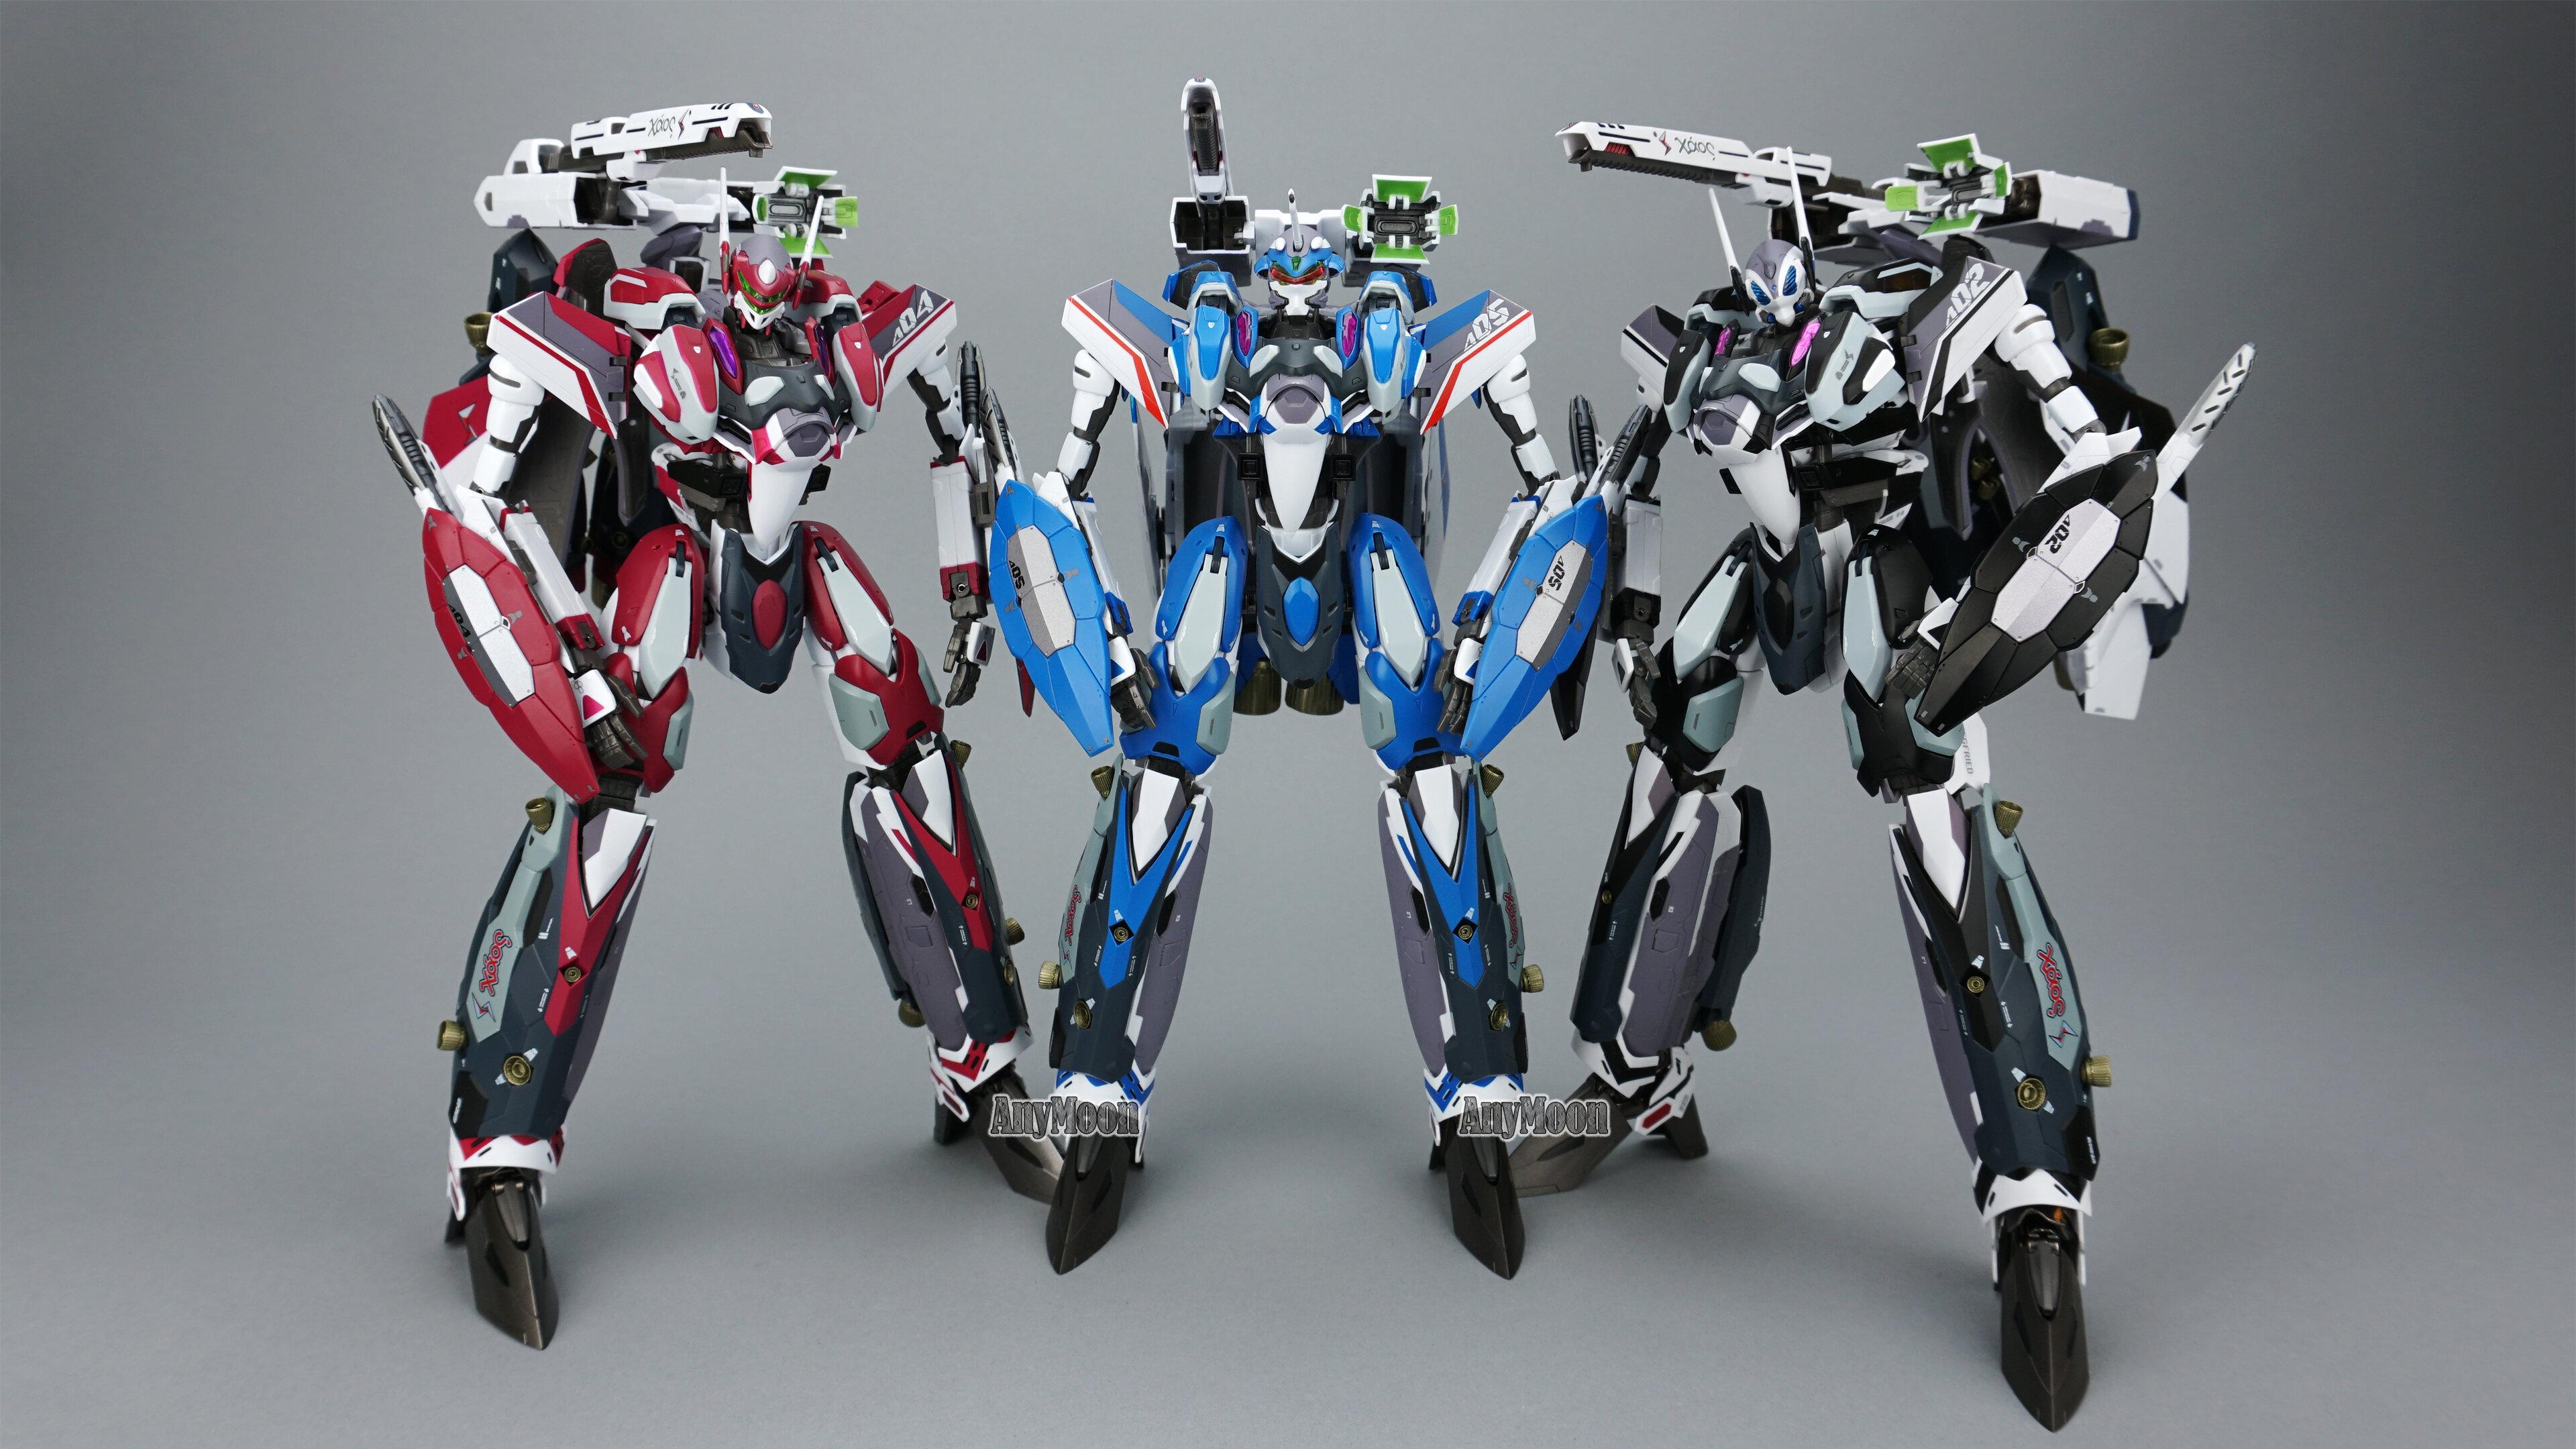 VF-31C-Super-Parts-8.jpg.9a3aec1f2ec5a338180c940beab7d64a.jpg